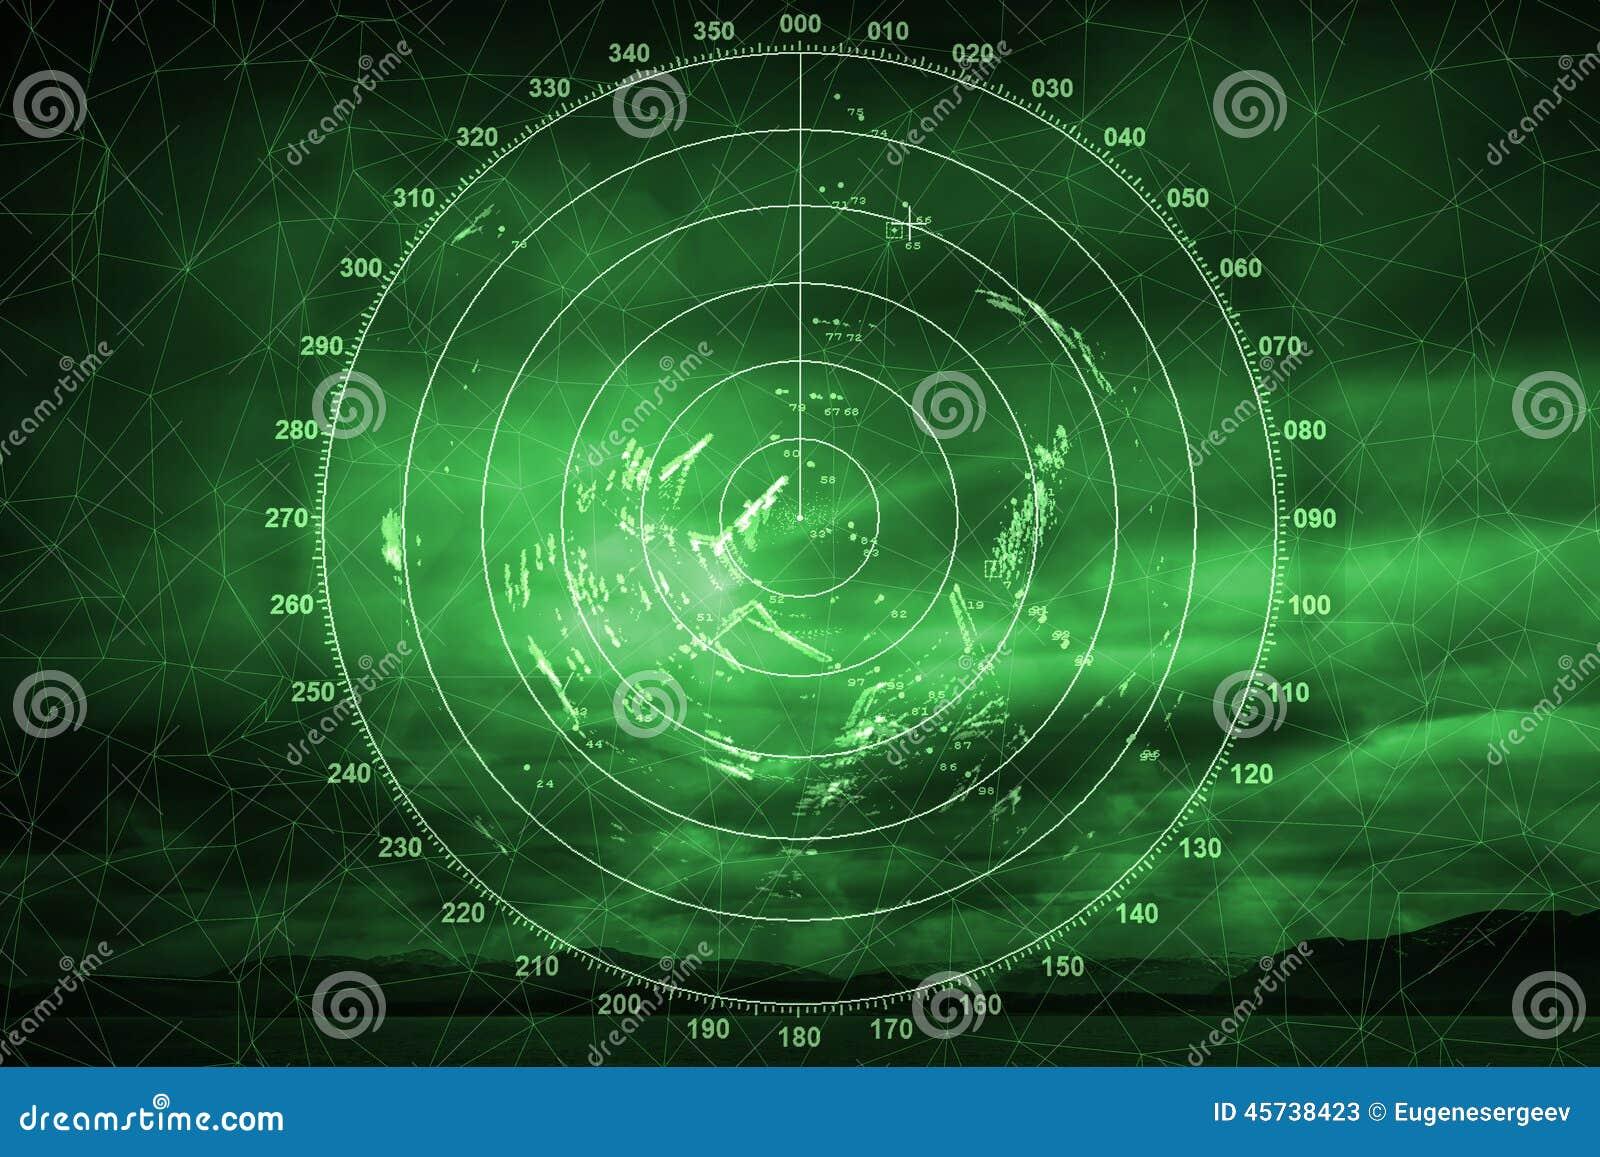 Green navigation system screen with radar image